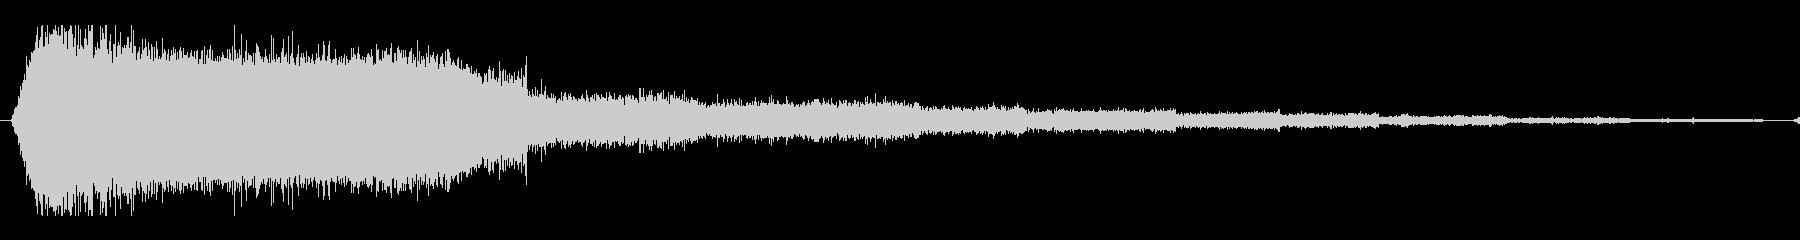 CANYON ECHOを使用した高...の未再生の波形